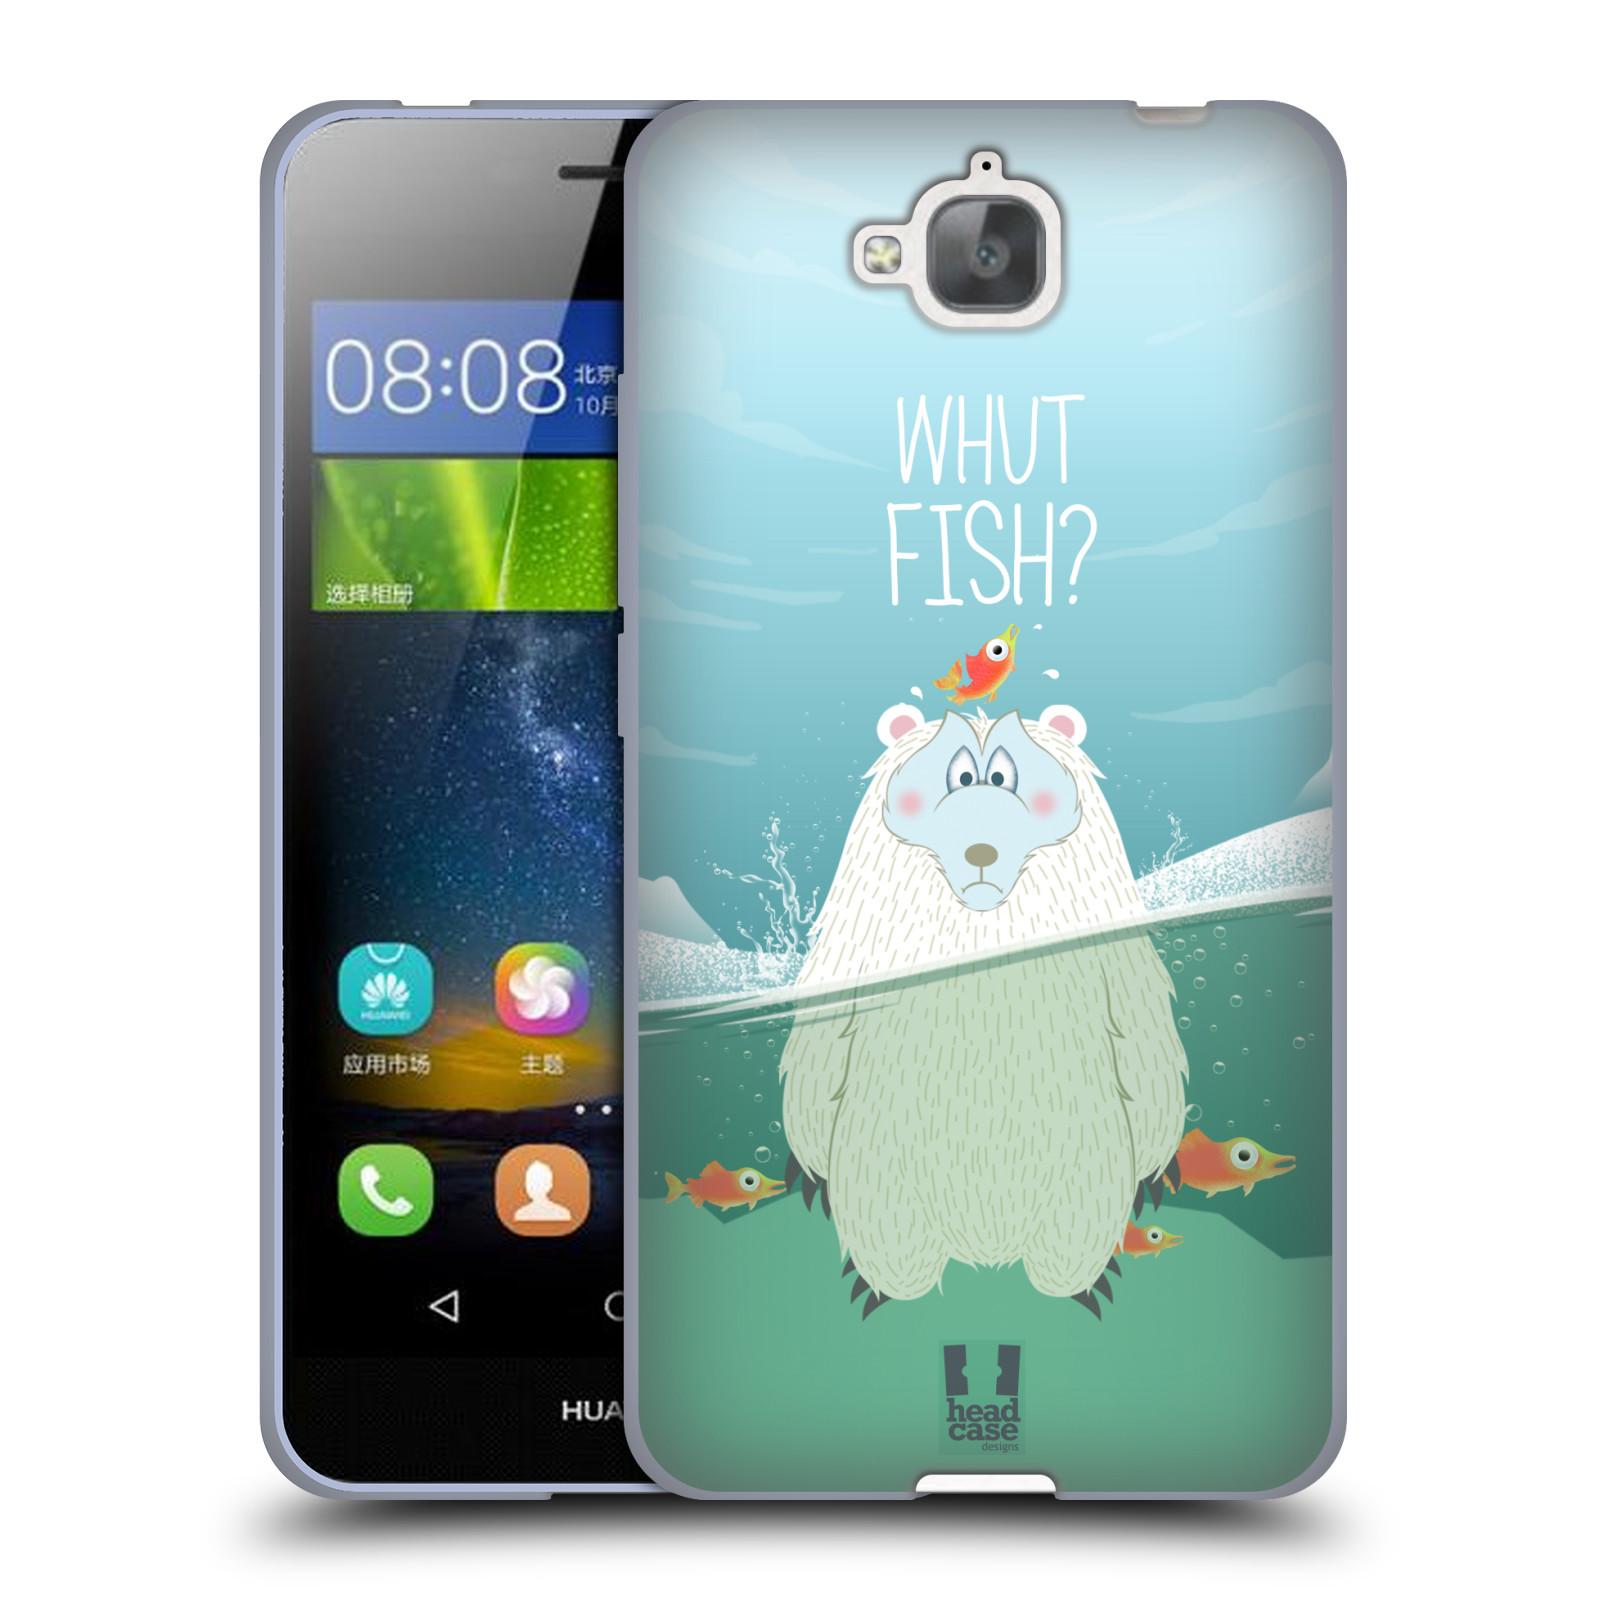 Silikonové pouzdro na mobil Huawei Y6 Pro Dual Sim HEAD CASE Medvěd Whut Fish?